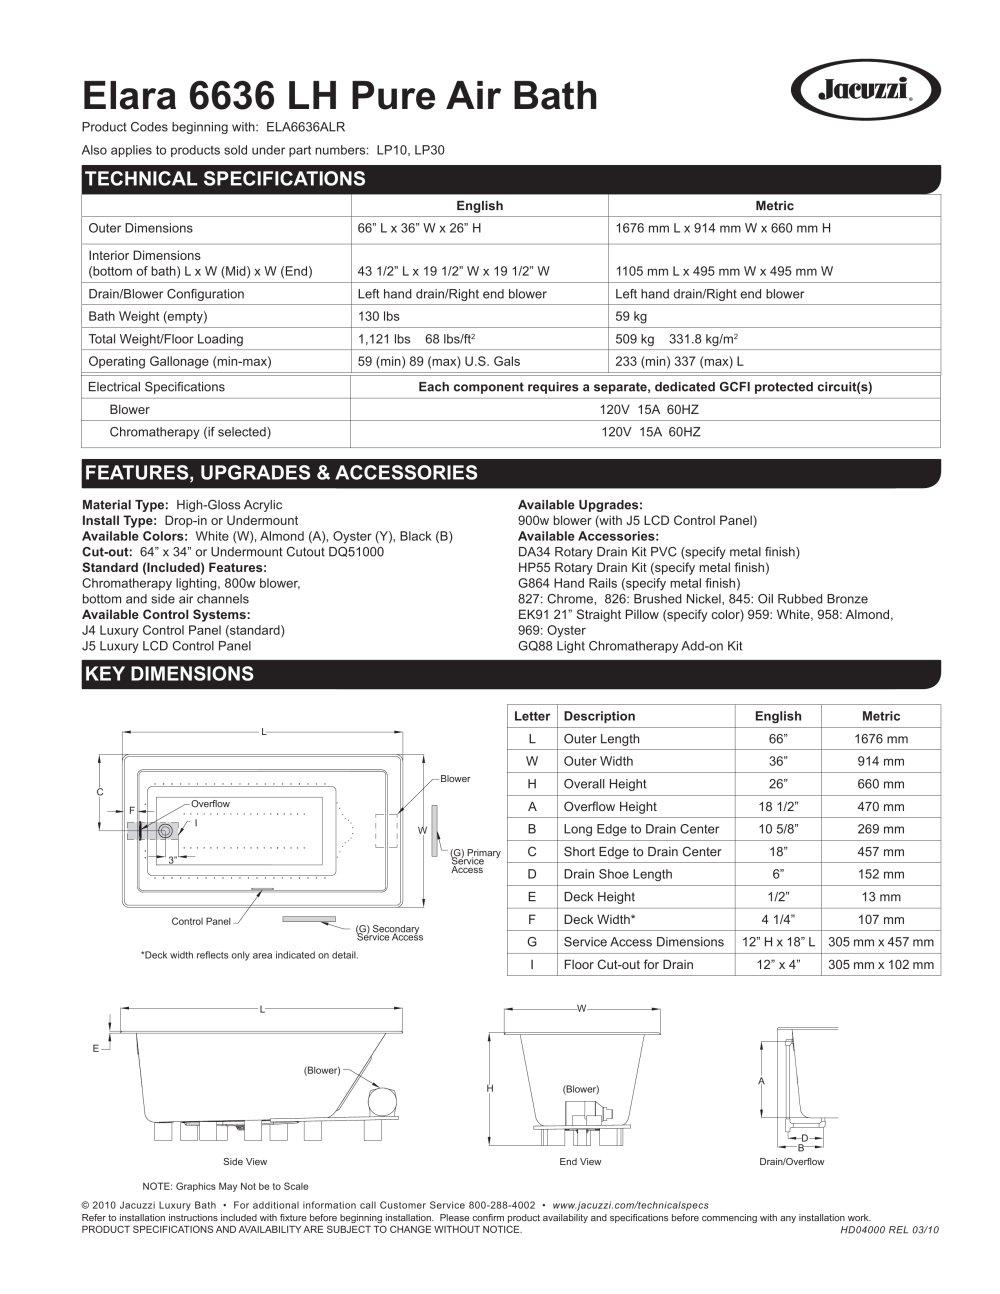 Elara 6636 LH Pure Air Bath - JACUZZI - PDF Catalogues ...